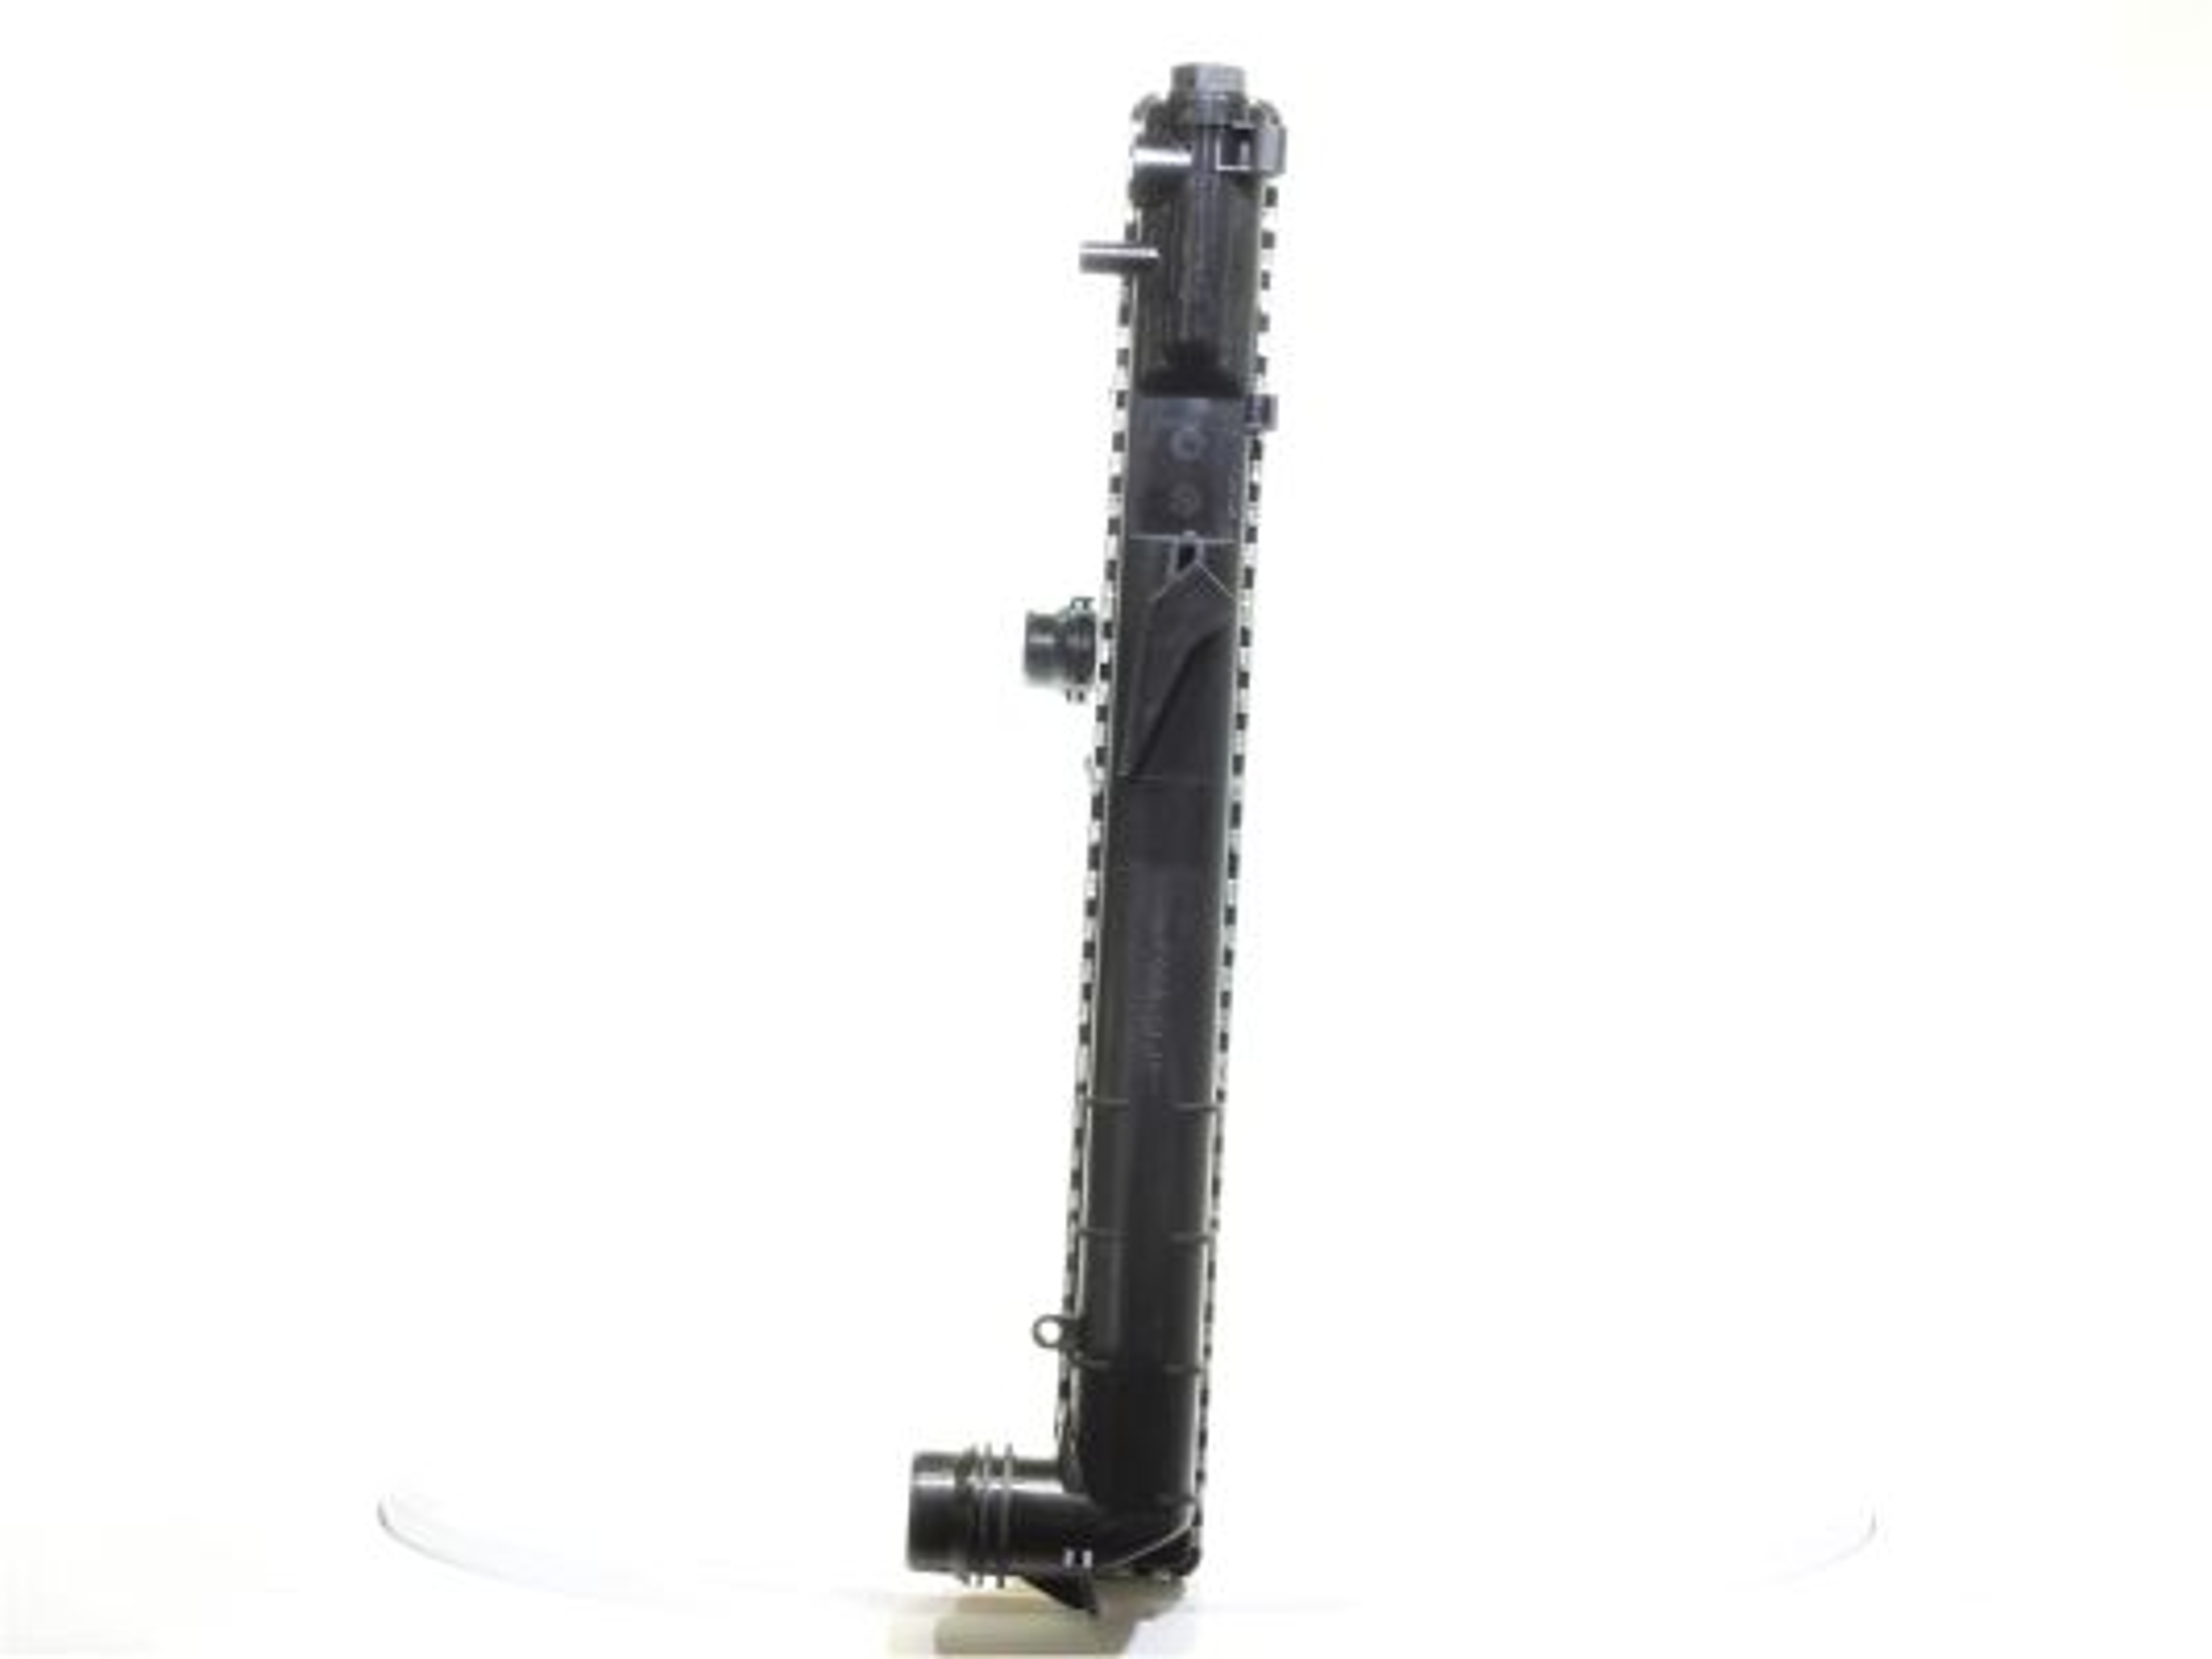 Radiateur moteur ALANKO 10530448 2247913024351